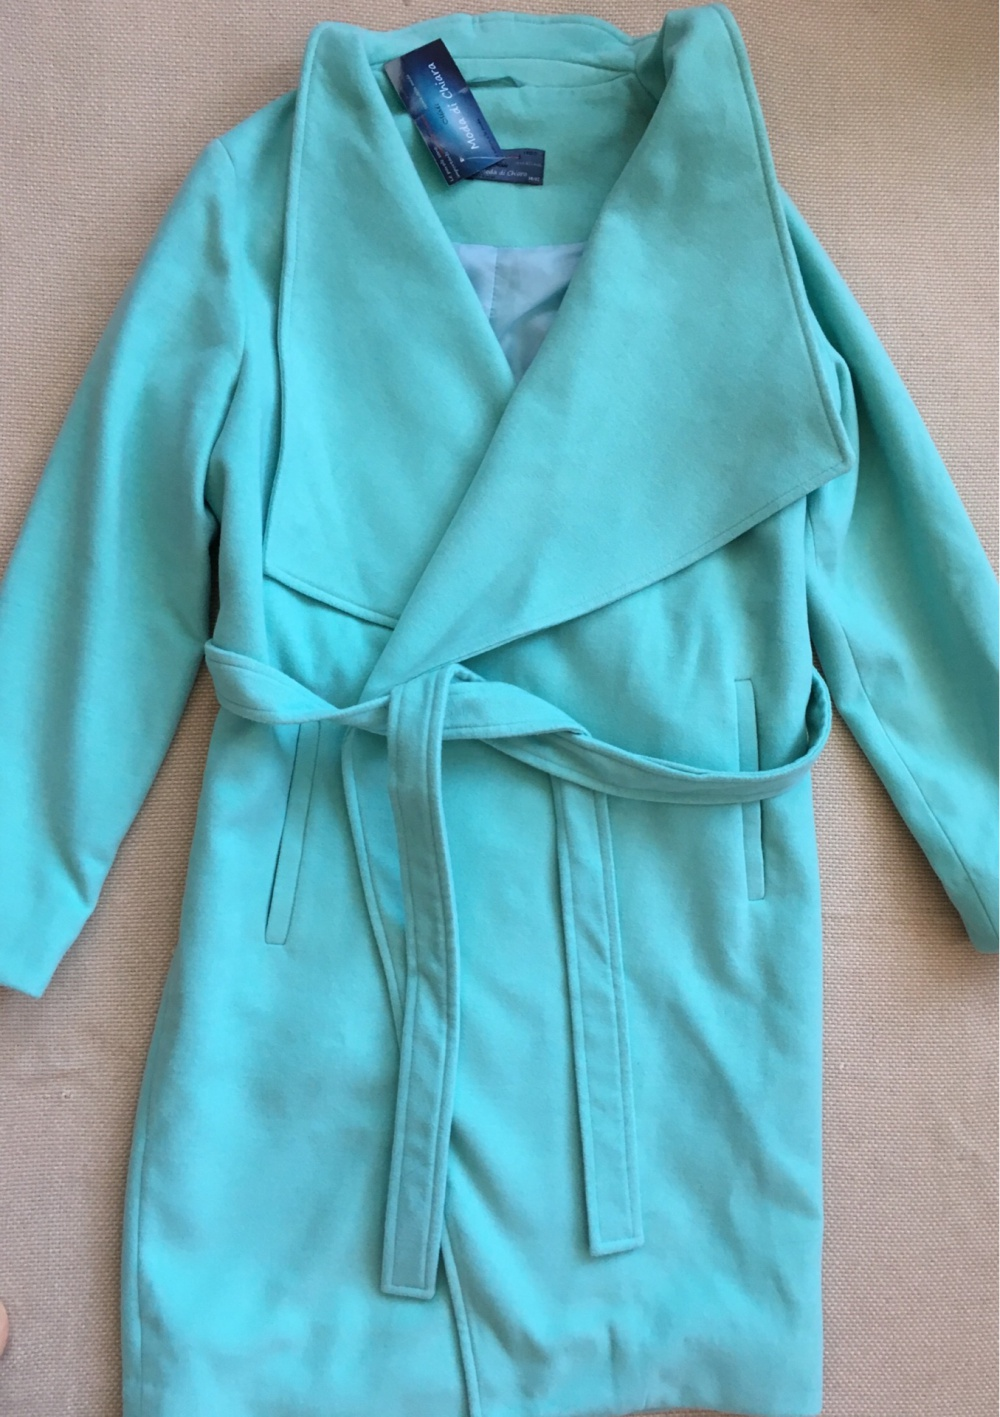 Пальто Moda di Chiara, размер 46,48,50